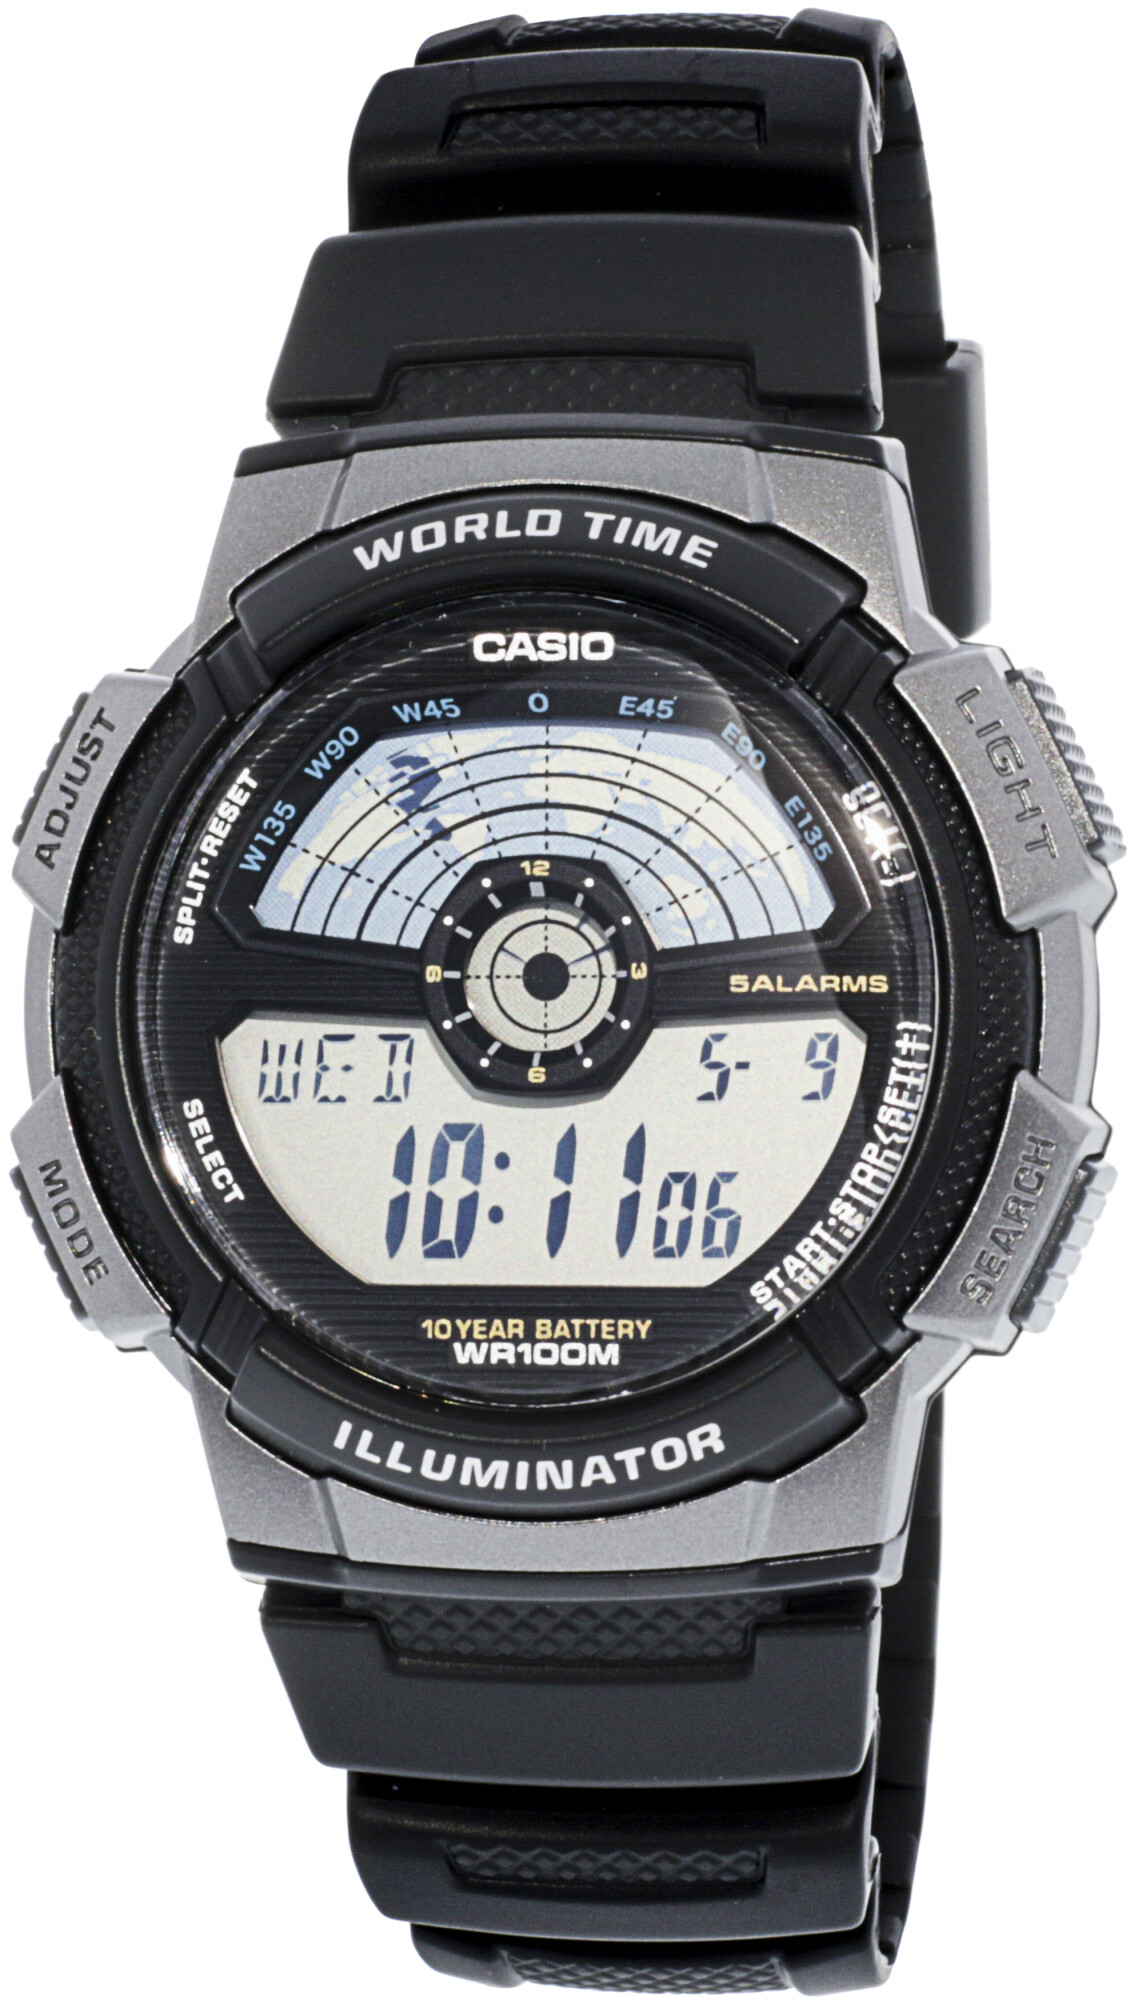 Casio Men's Core AE1100W-1AV Black Resin Japanese Quartz Sport Watch